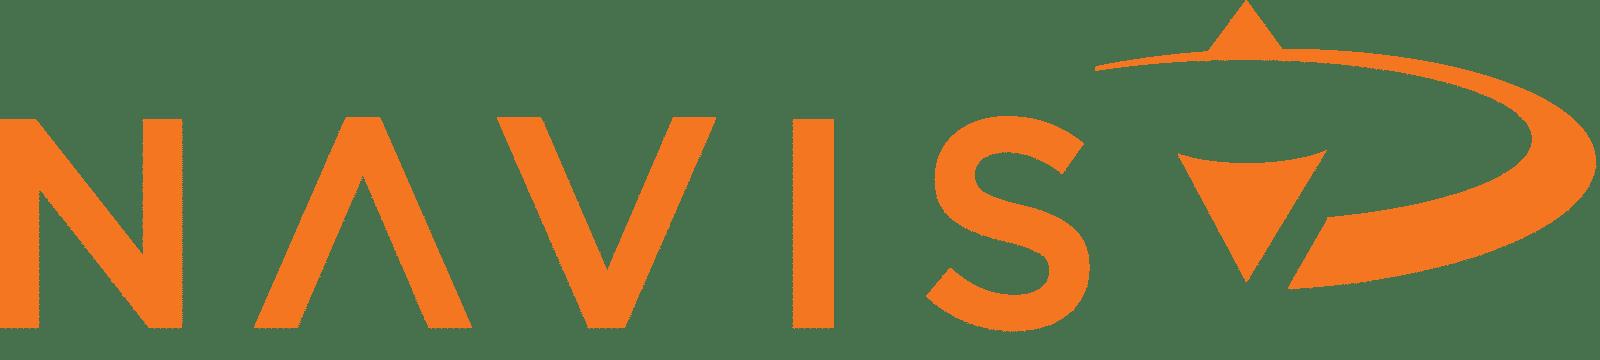 NAVIS-logo-large-no-tagline (9)